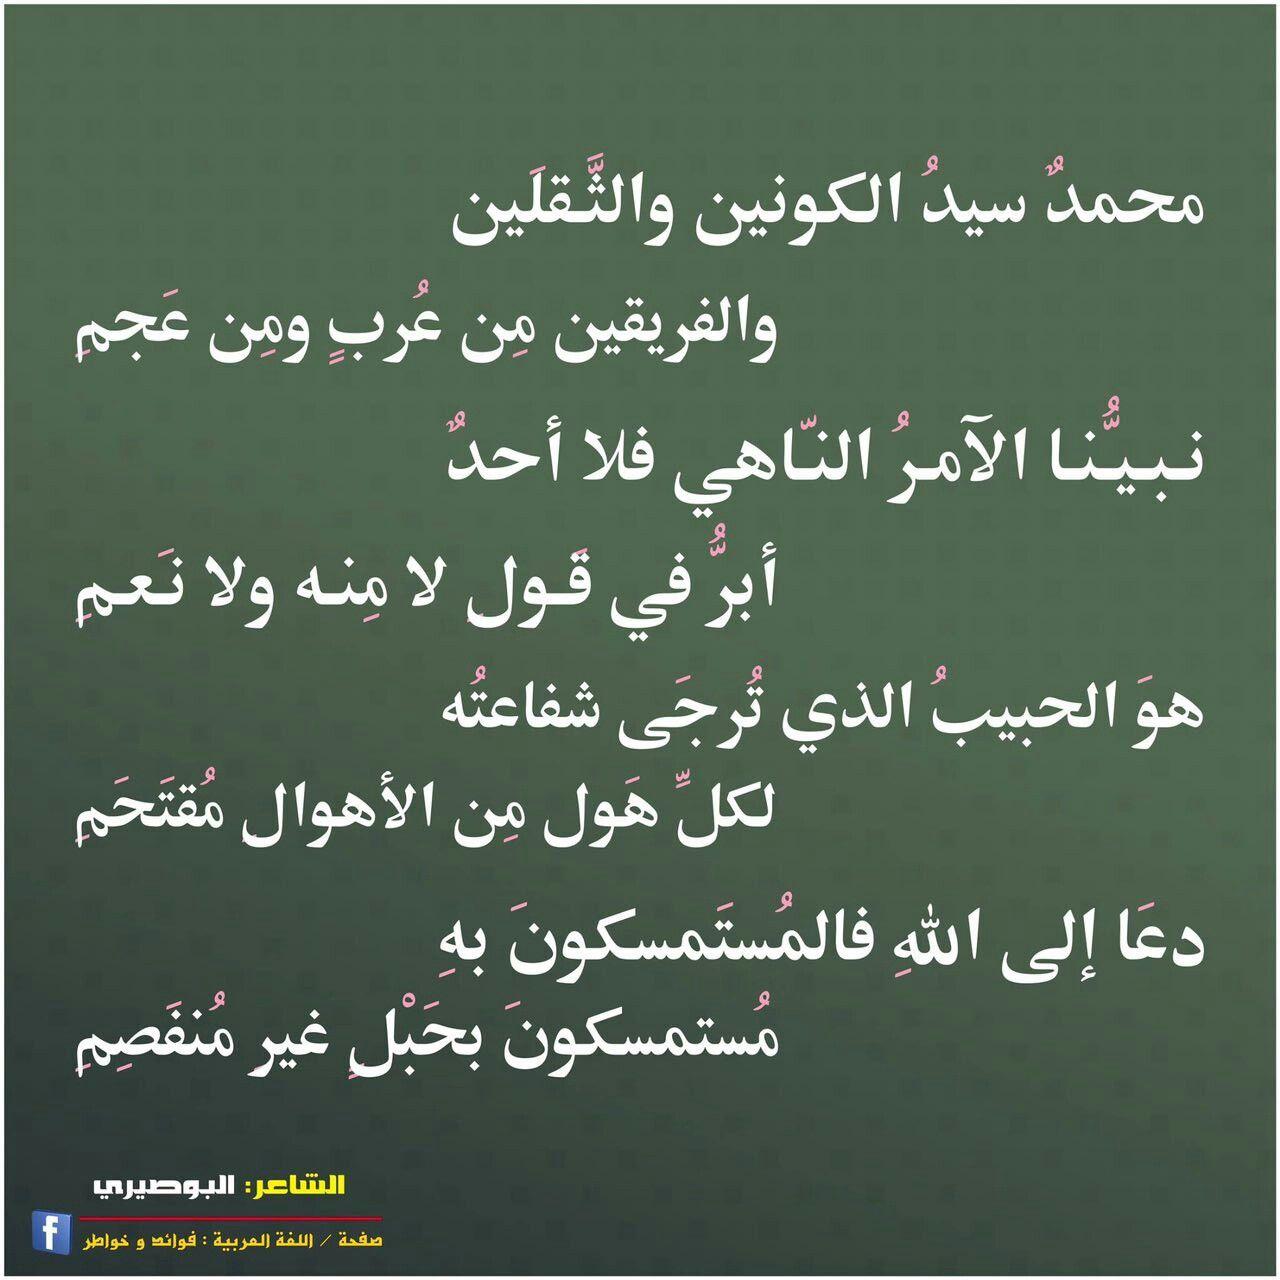 محمد سيد الكونين والثقلين شعر Words Of Wisdom Blessed Are Those Words